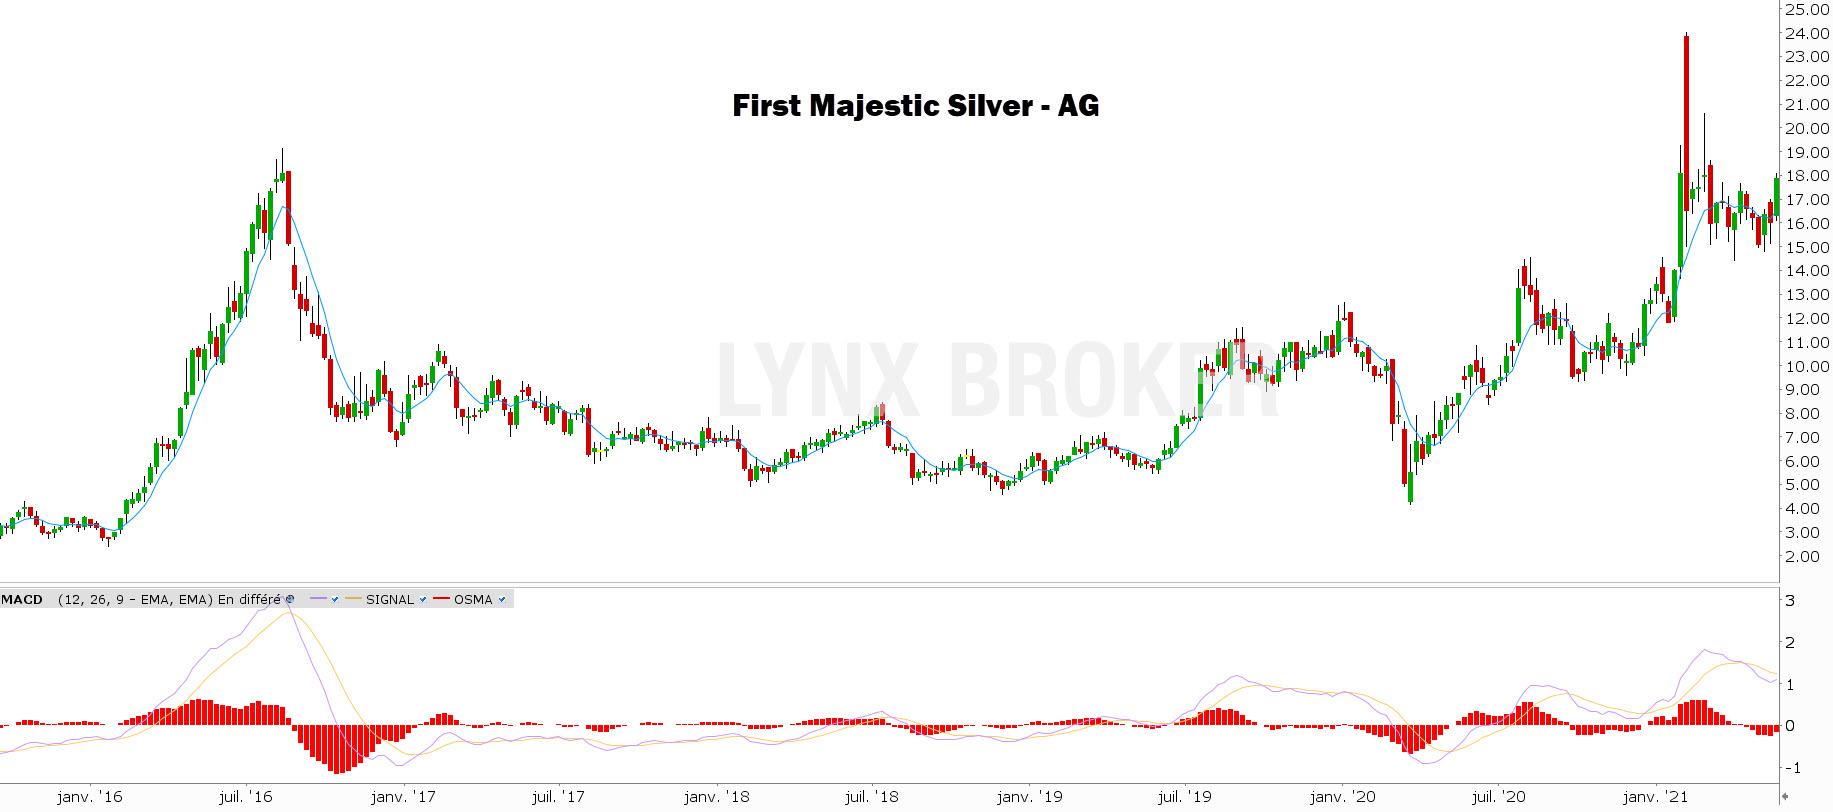 investir dans l'argent First Majestic Silver